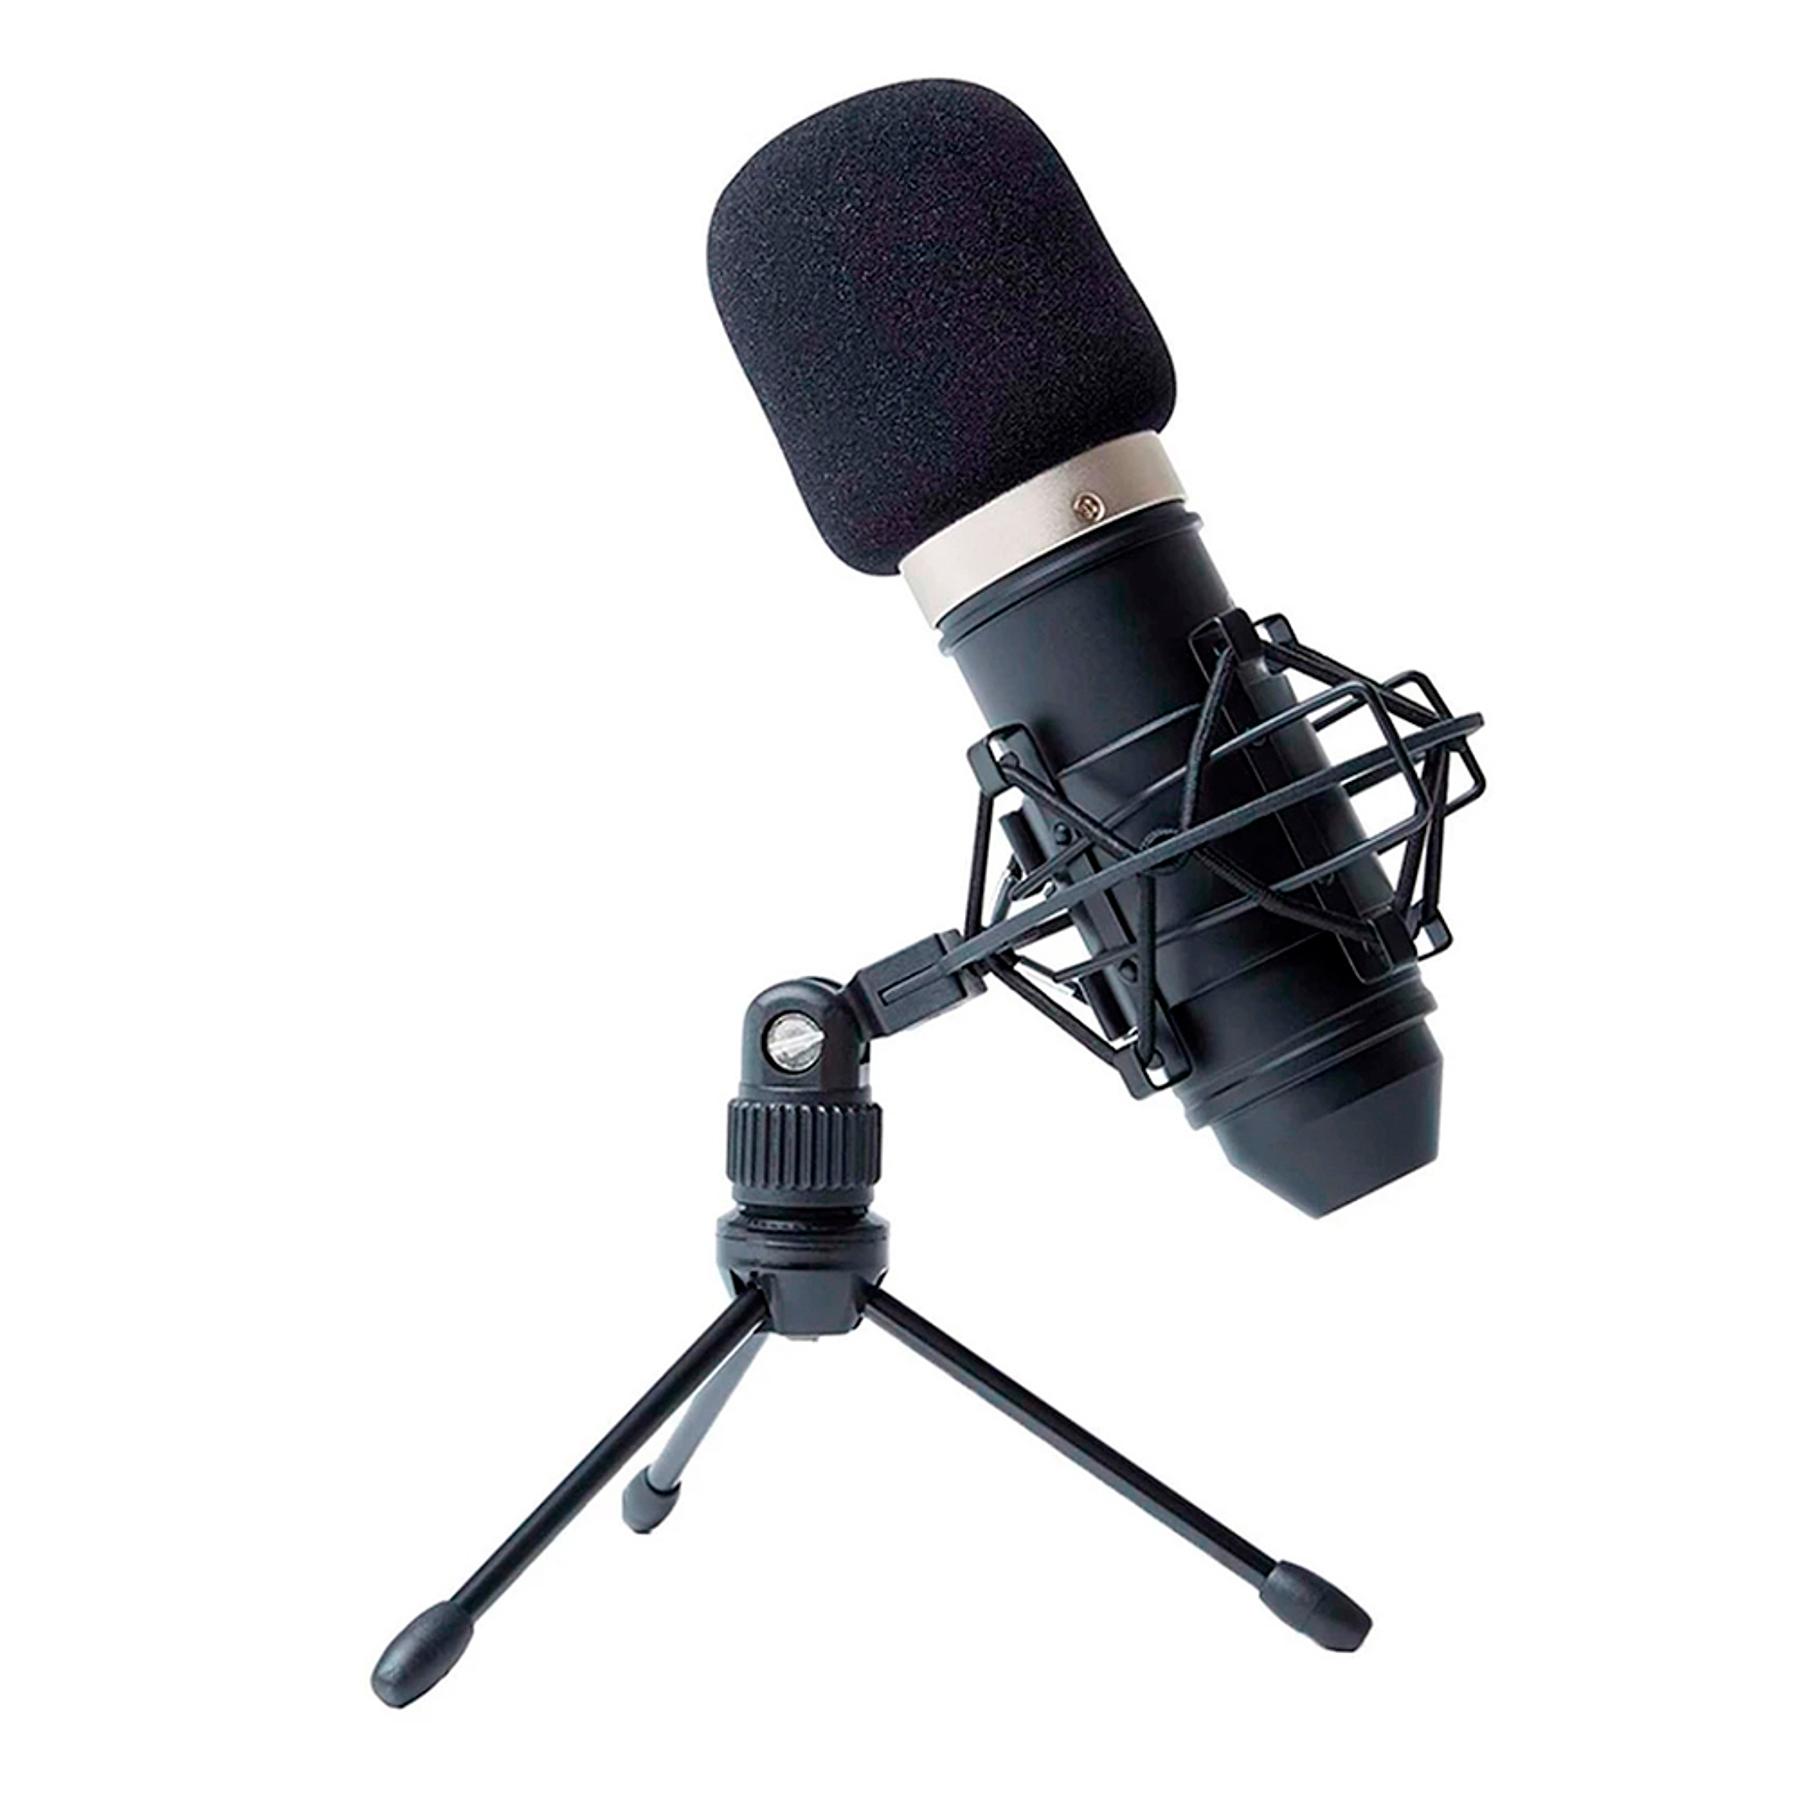 Microfono Condensador Marantz MPM-1000